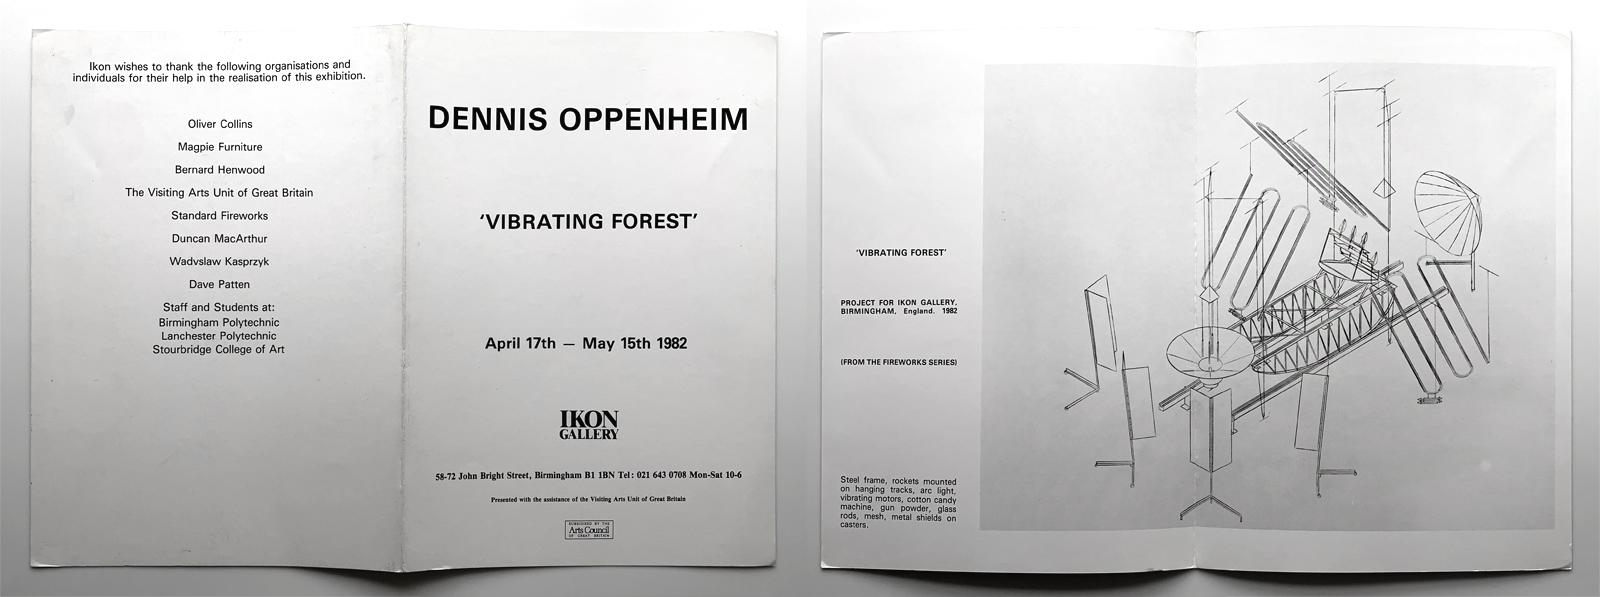 Oppenheim Catalogue